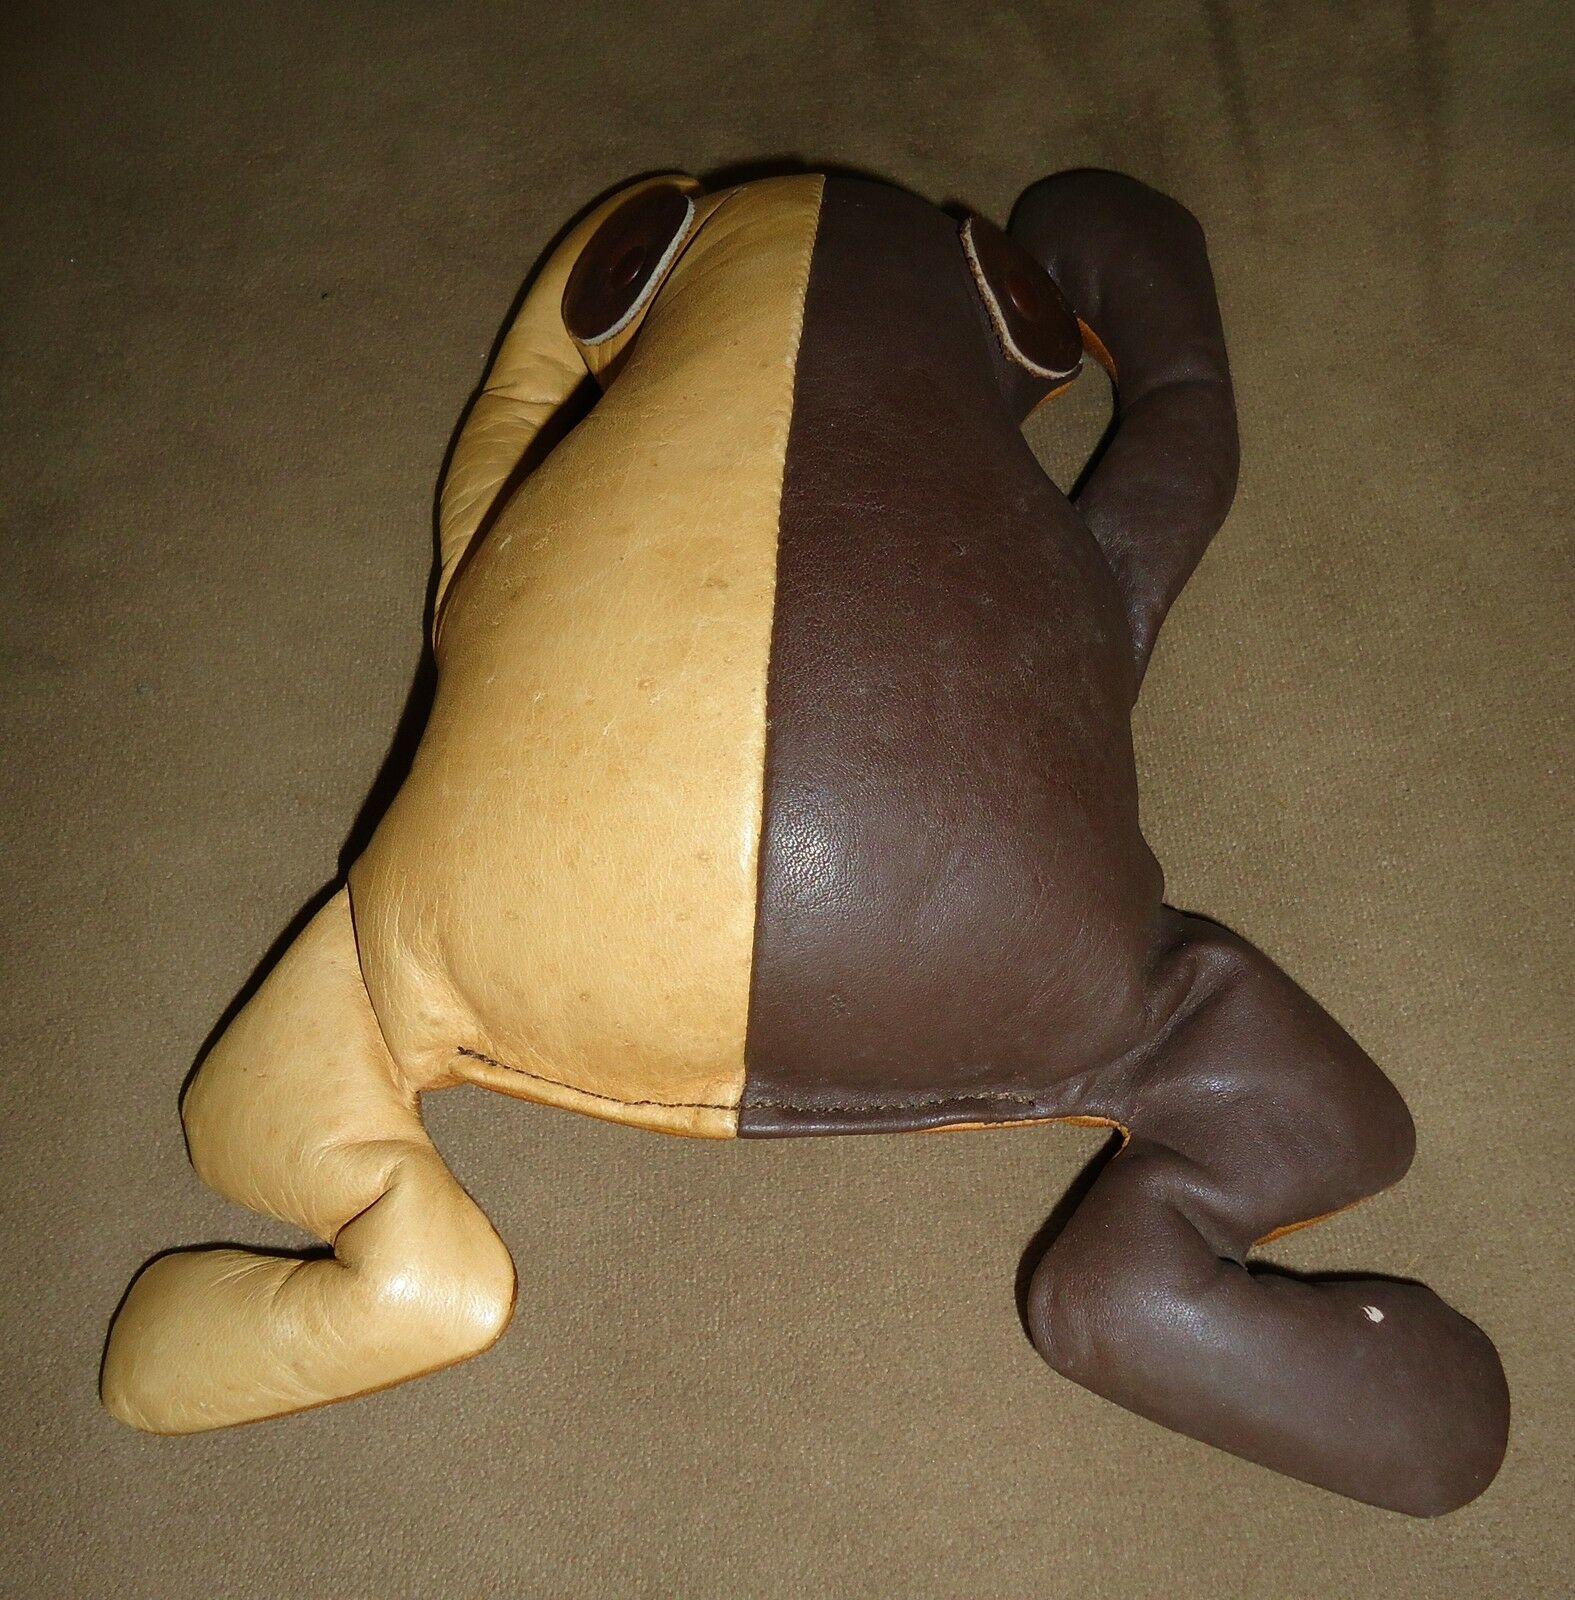 MUNDI Leather Frog Animal Reptile Plush DecorHand Crafted BRAZIL VTG ESTATE RARE image 2